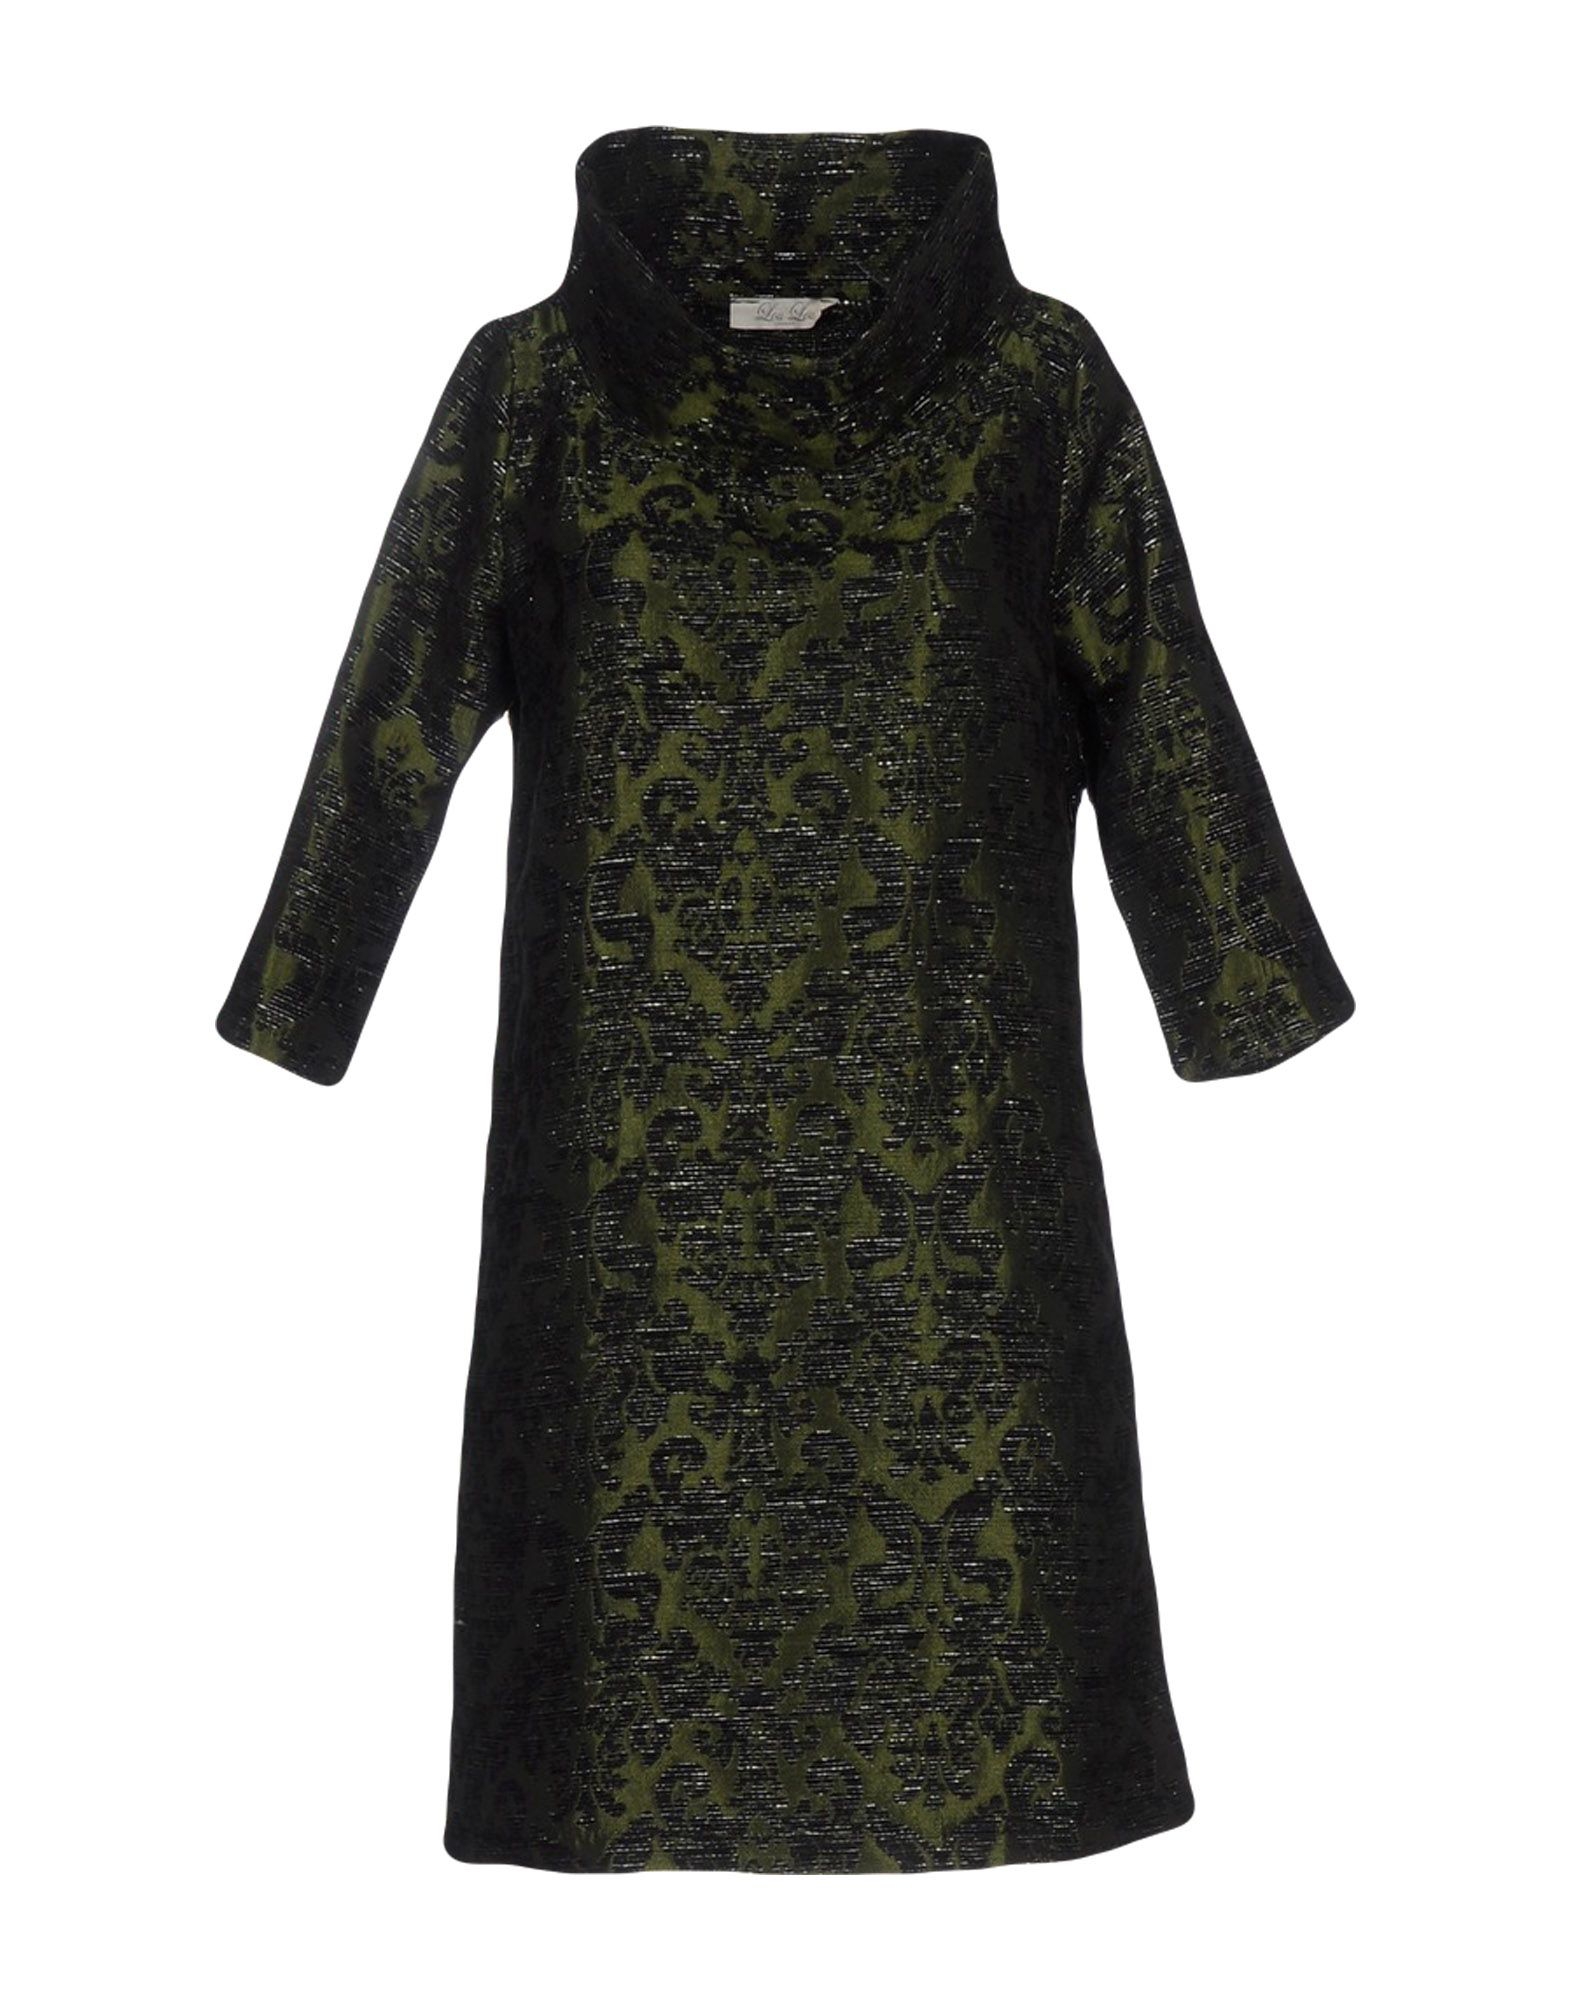 LOU LONDON Damen Kurzes Kleid Farbe Militärgrün Größe 5